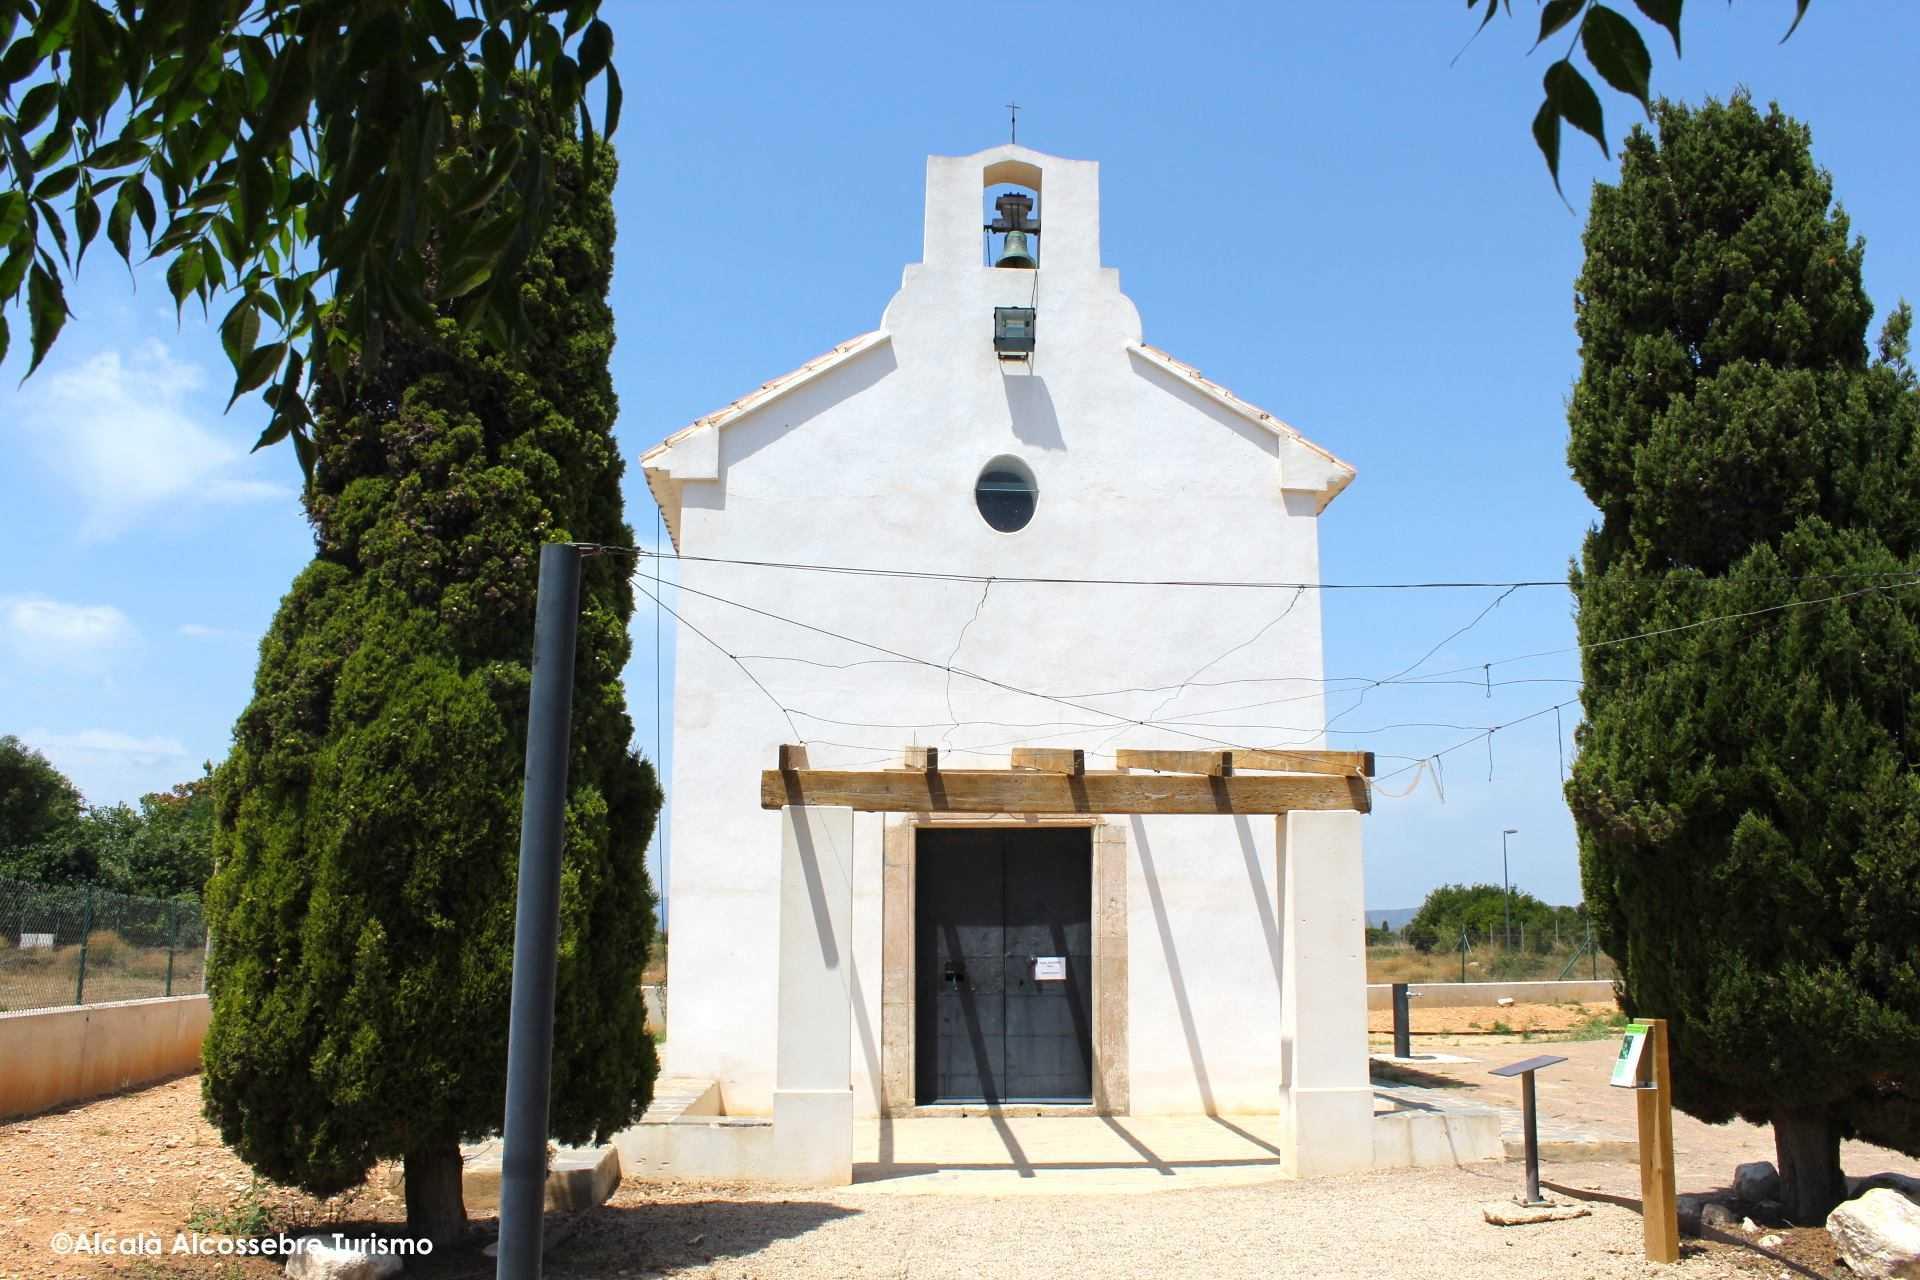 Festivitat de Sant Antoni de Pàdua